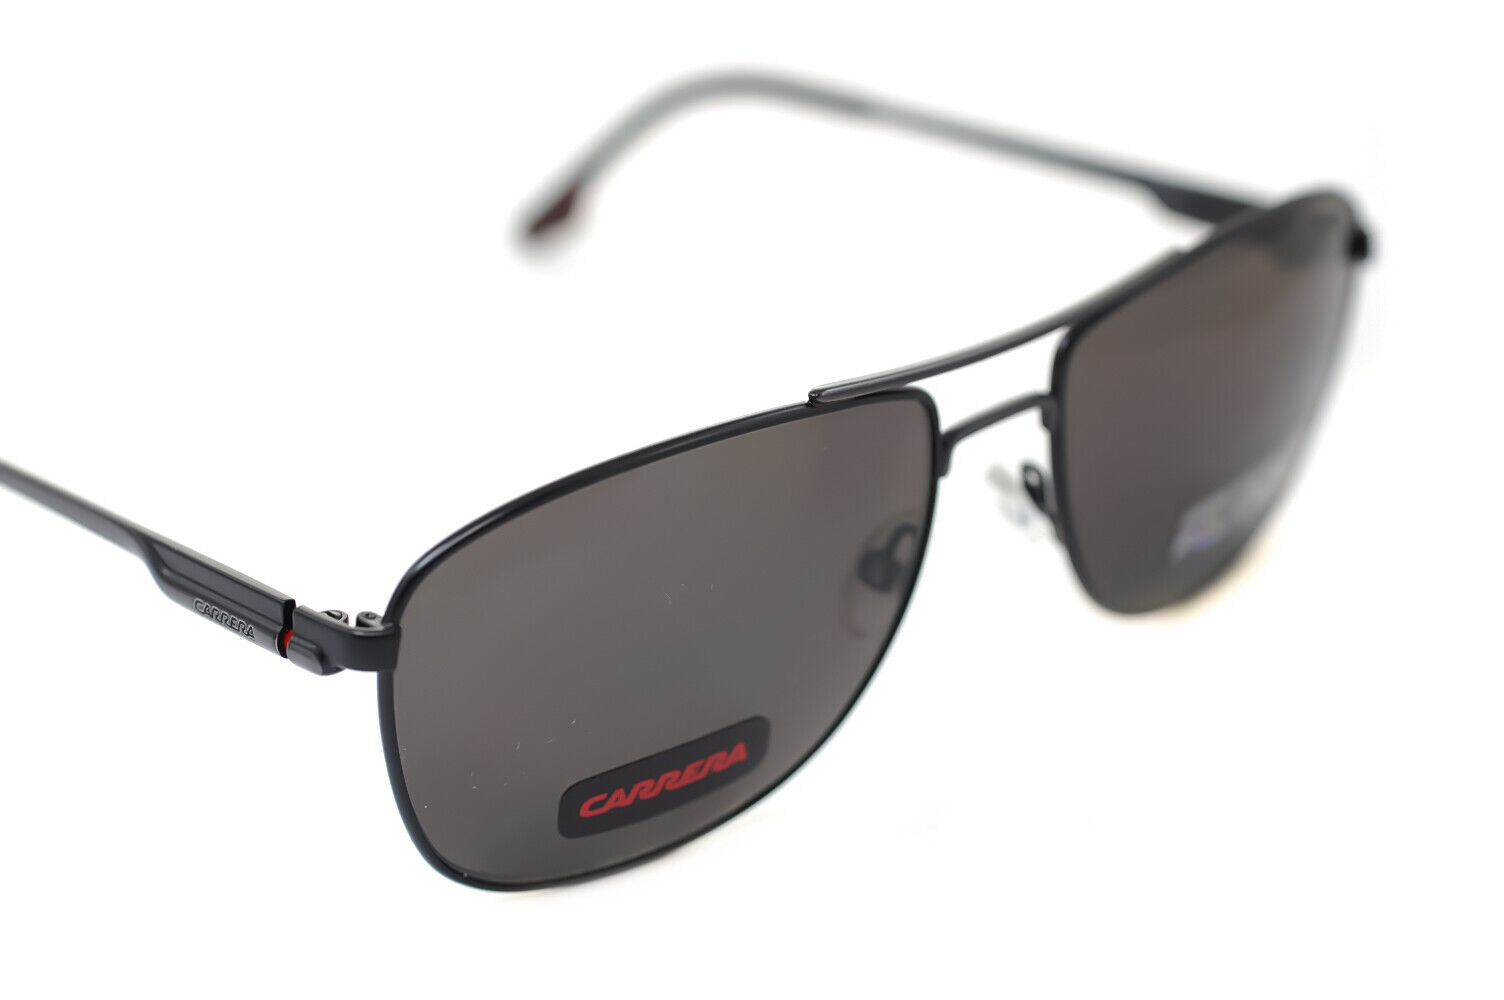 Gafas Cuadrado Metal De Detalles 832m9 65 56mm Hombre Aviator Carrera Sol Polarizados lTF1cKJ